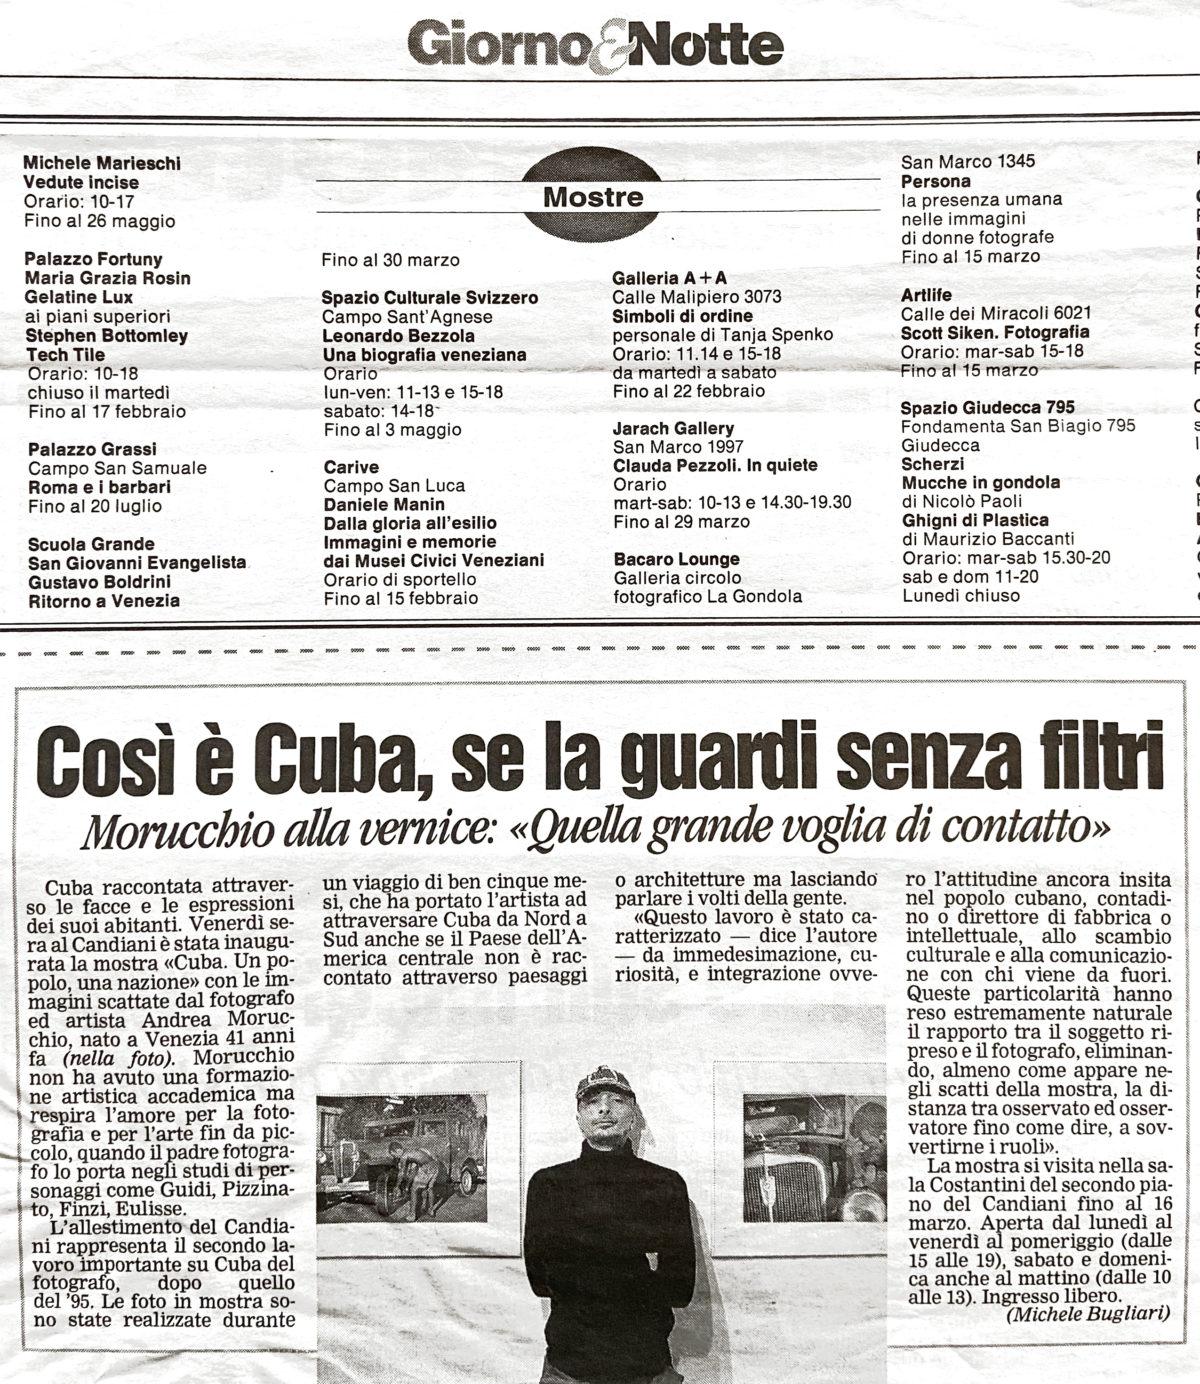 La Nuova Ve  | 10.02.2008